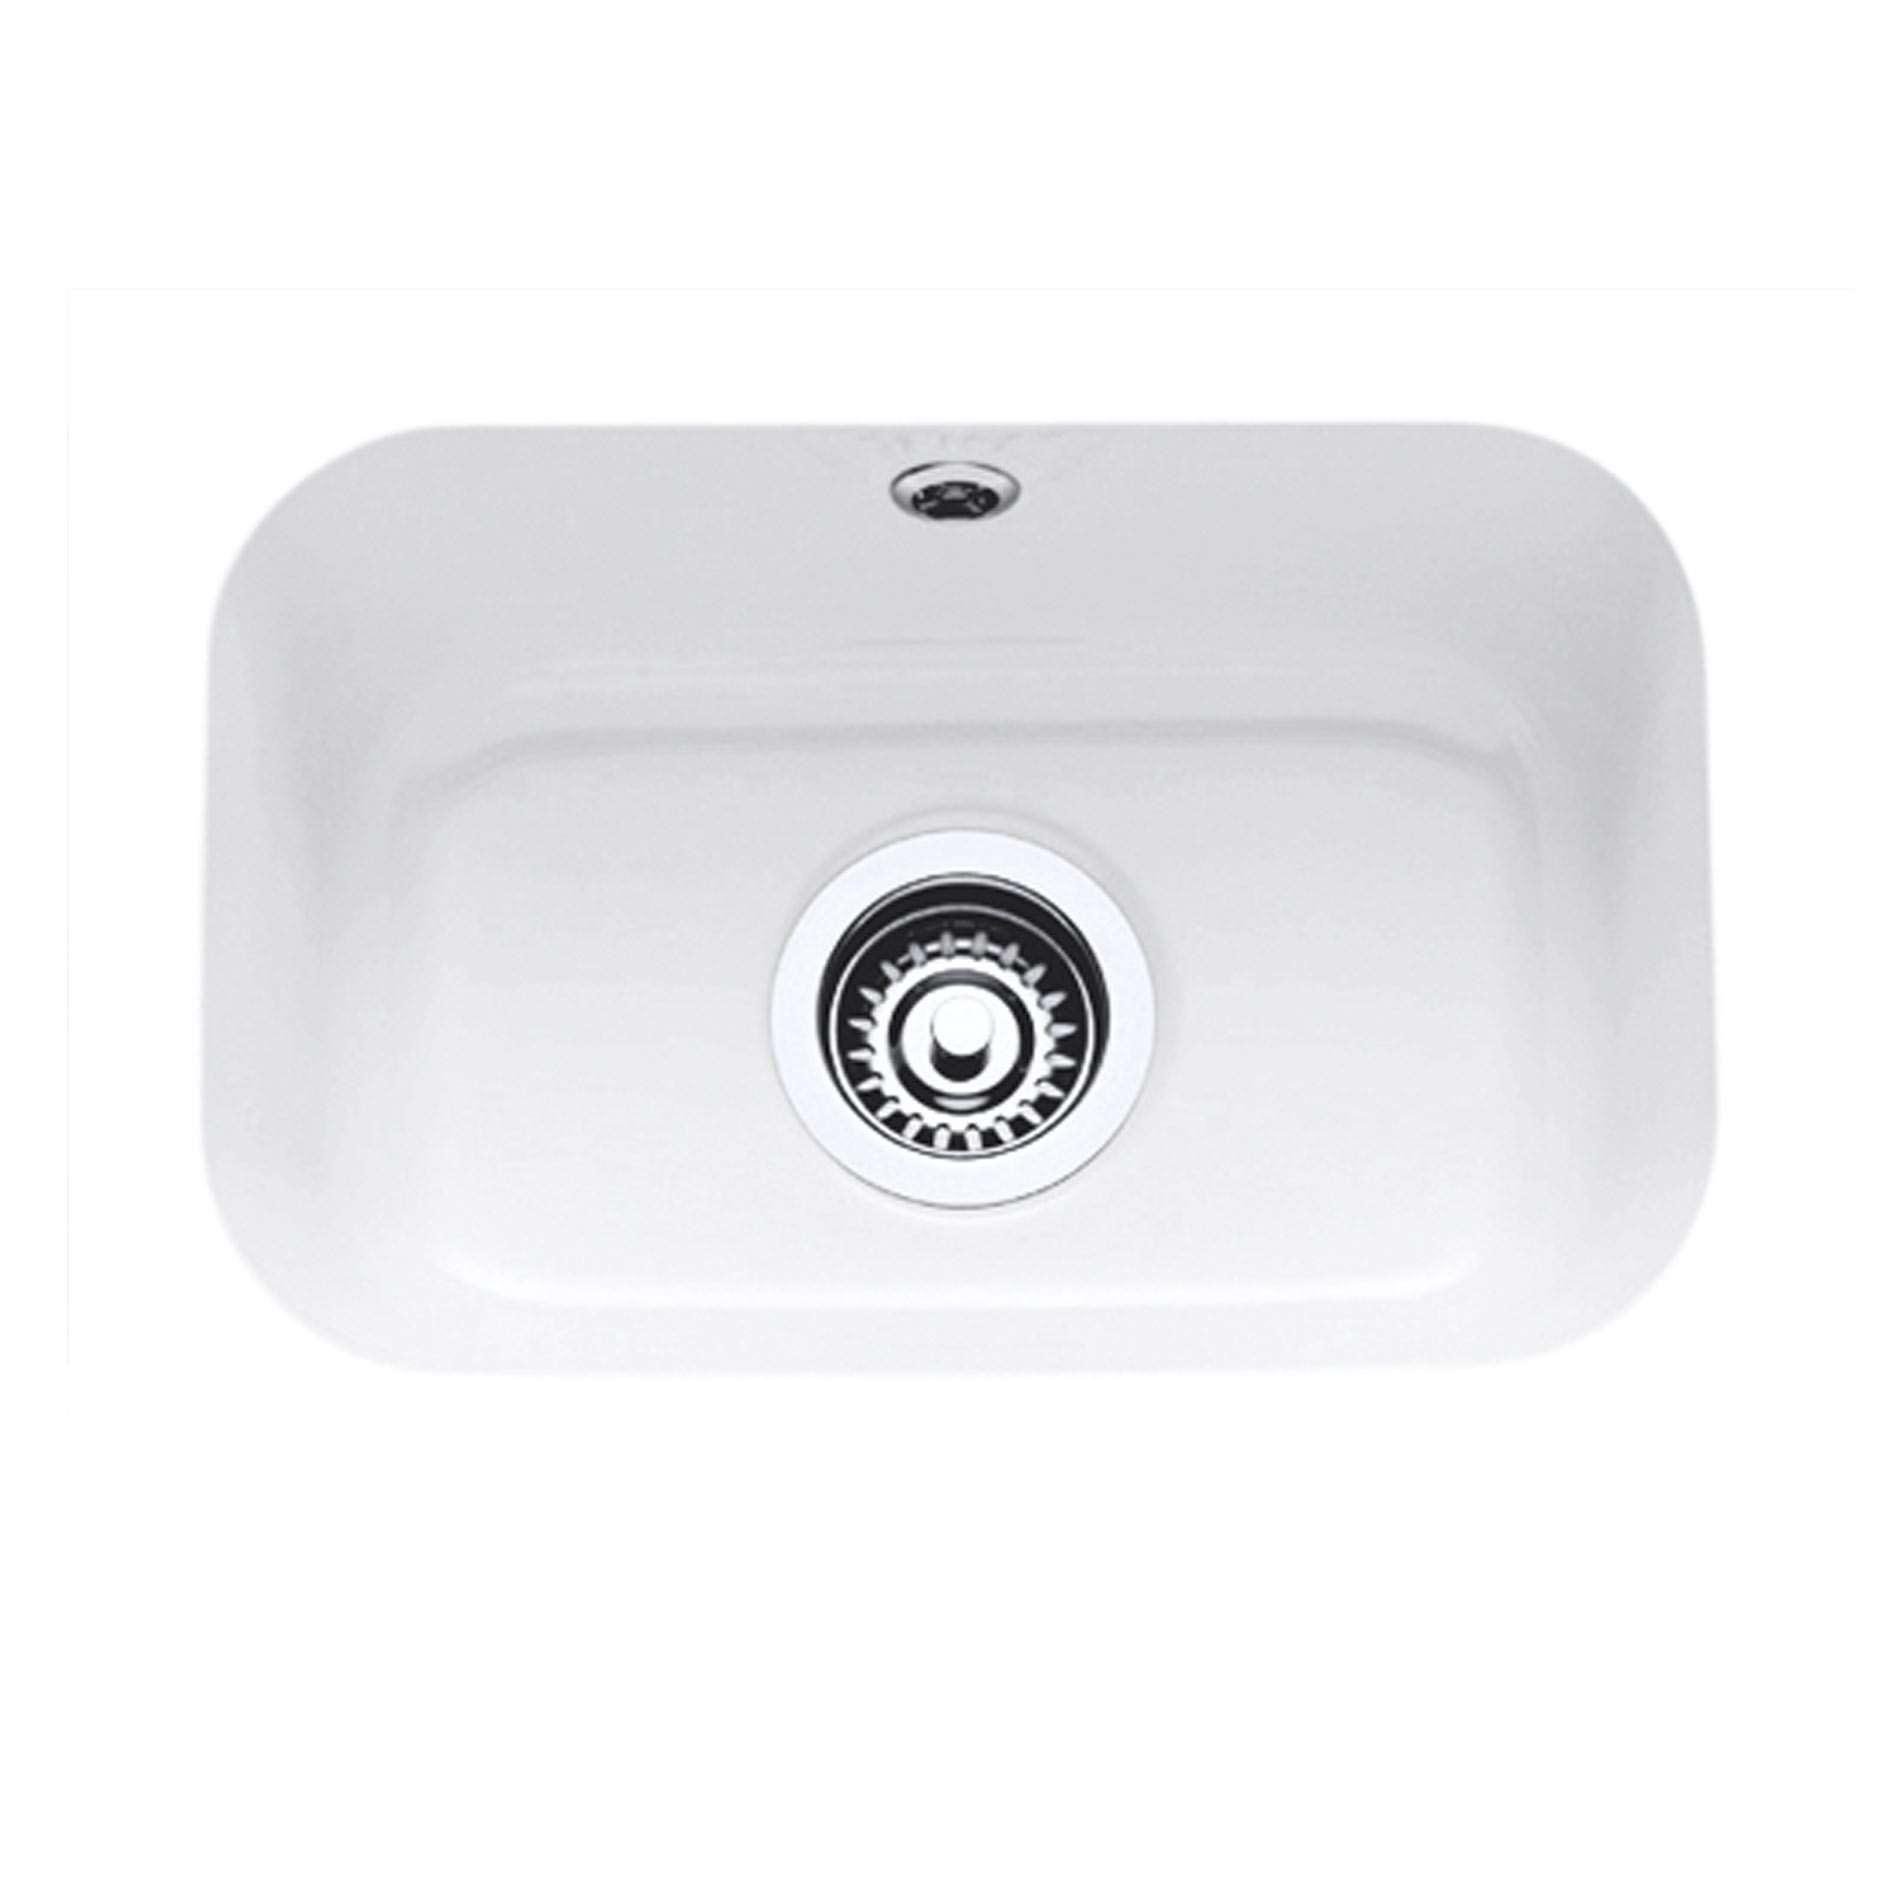 kohler kitchen sinks porcelain cabinet manufacturers canada modultop 19941w fireclay ceramic sink